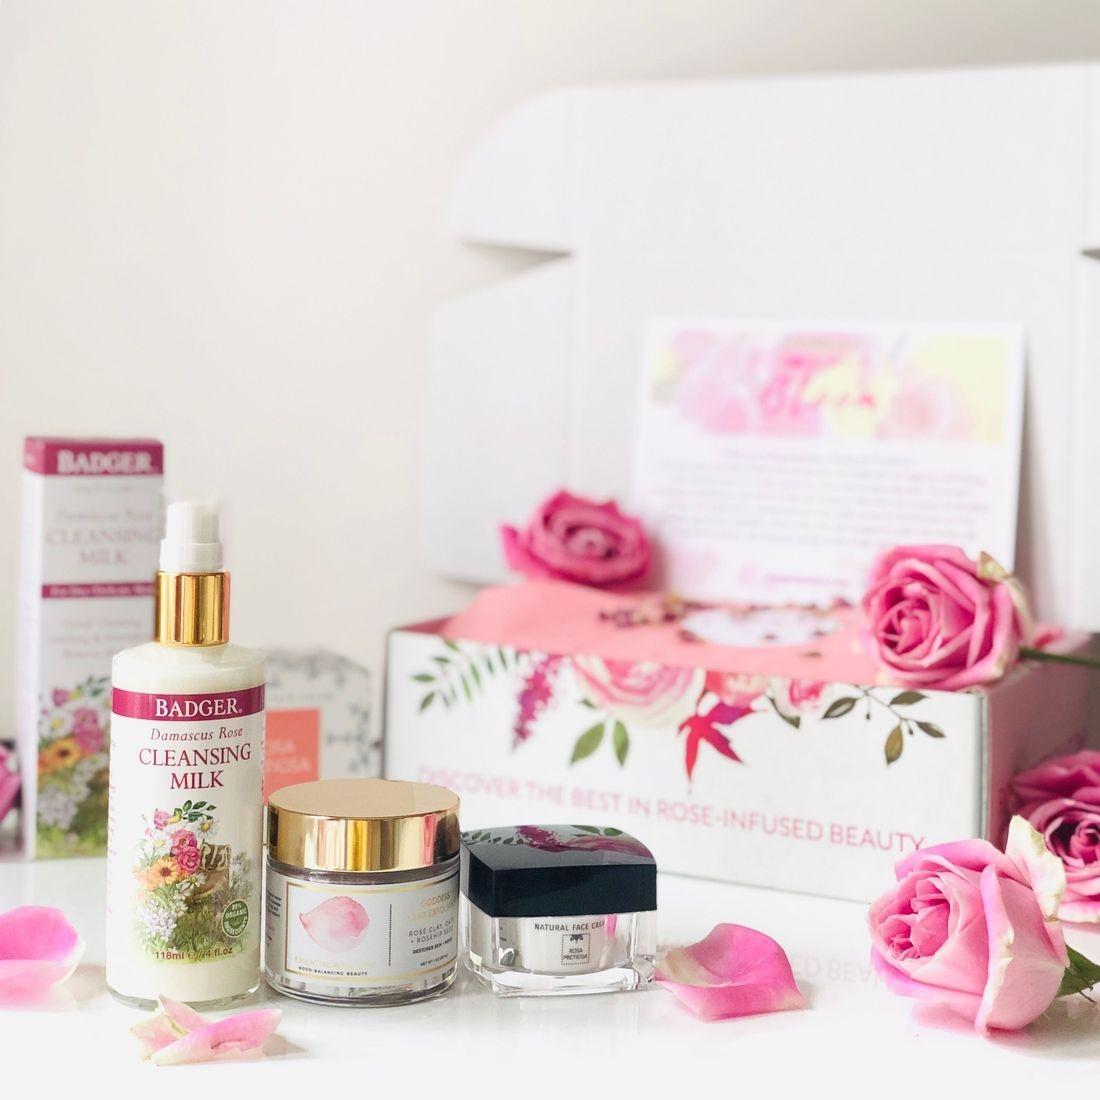 Best Rose-infused Skincare, Clean Beauty Box, Aromatherapy Box, Bulgarian Rose Oil, Rose Oil, RosePost Fall Box, RosePost Box, Green Beauty Subscription, Rose Beauty Box, Green Beauty Box, Valentines Day Gift, Best Rose Skincare